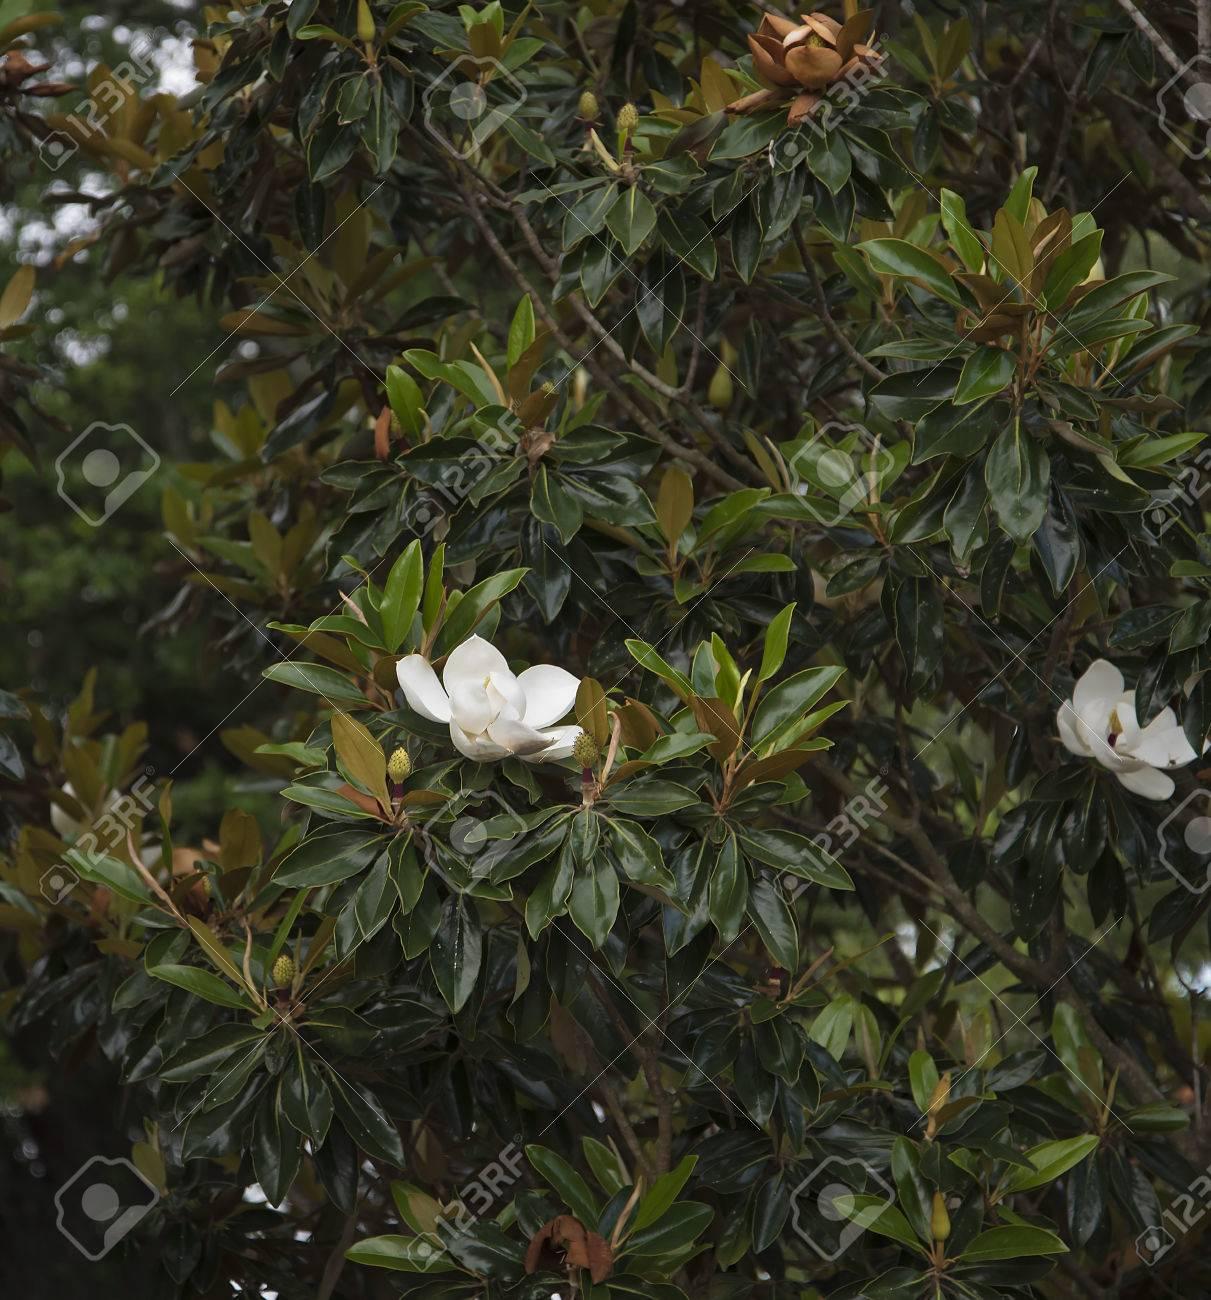 Magnolia Trees In The City Park Of New Orleans Louisiana Usa Stock